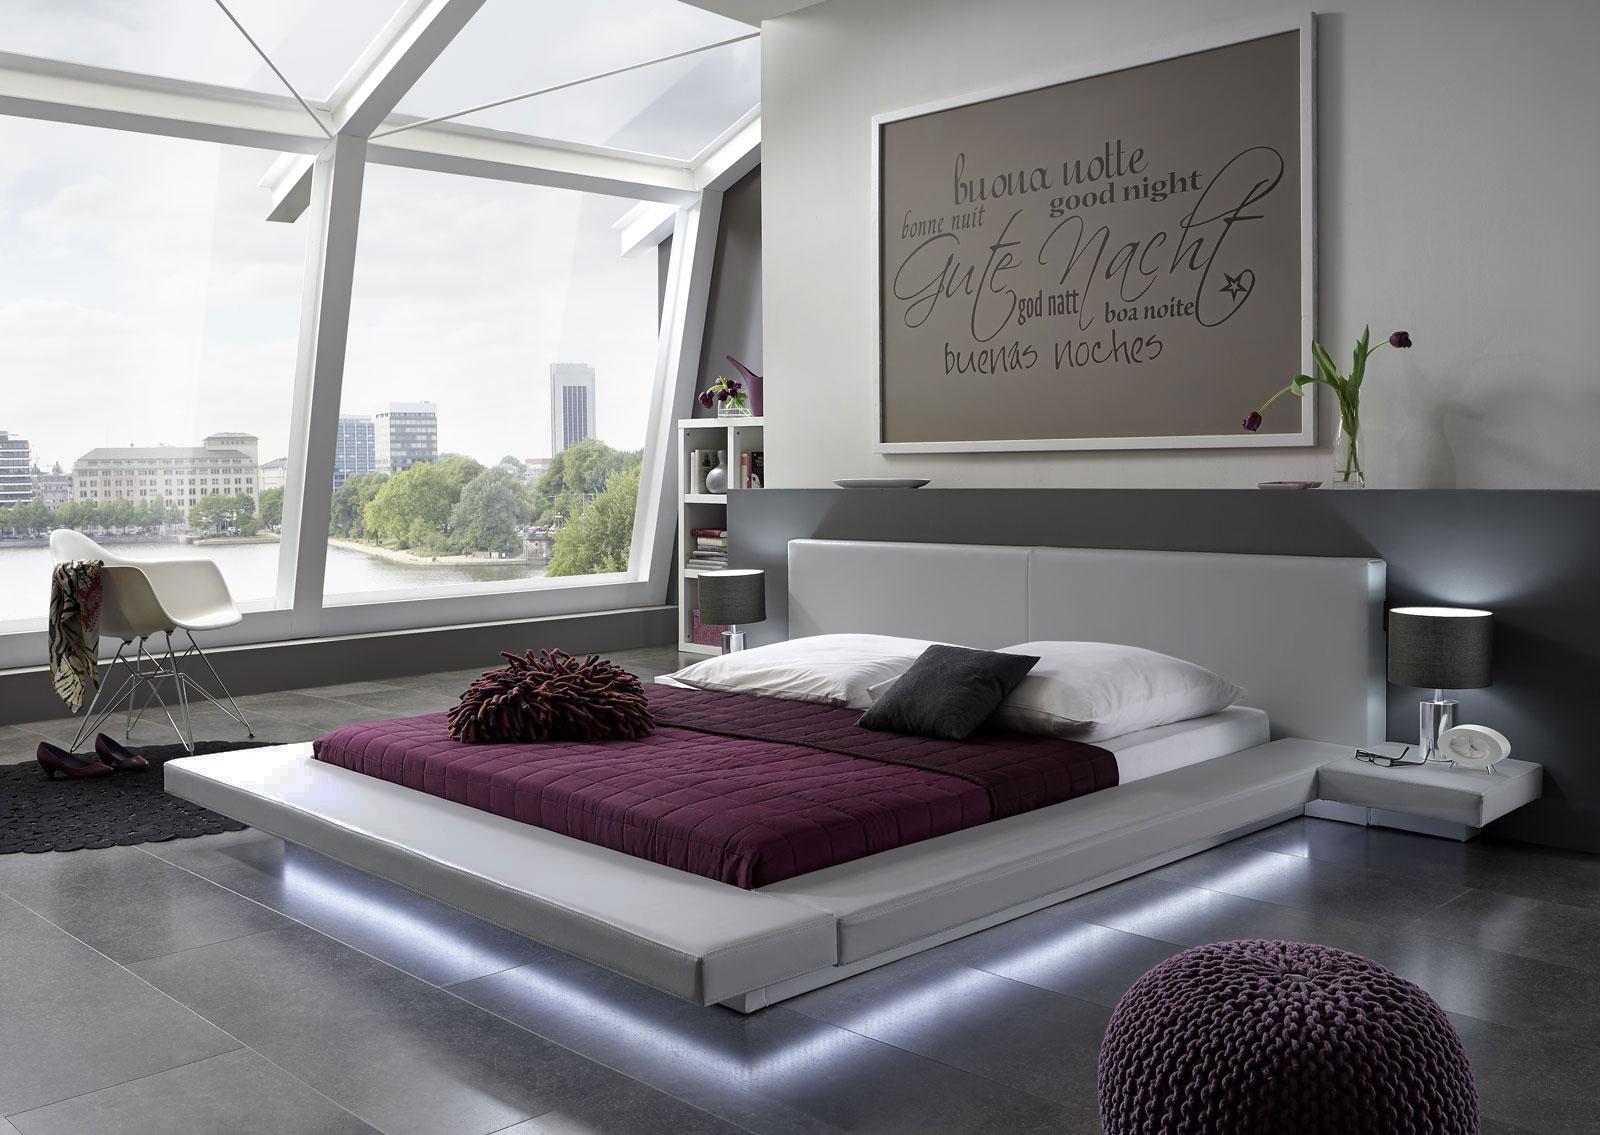 Full Size of Polsterbett 200x220 Wasserbetten Europacom Euro Perla 200 220 Cm Grau Led Bett Betten Wohnzimmer Polsterbett 200x220